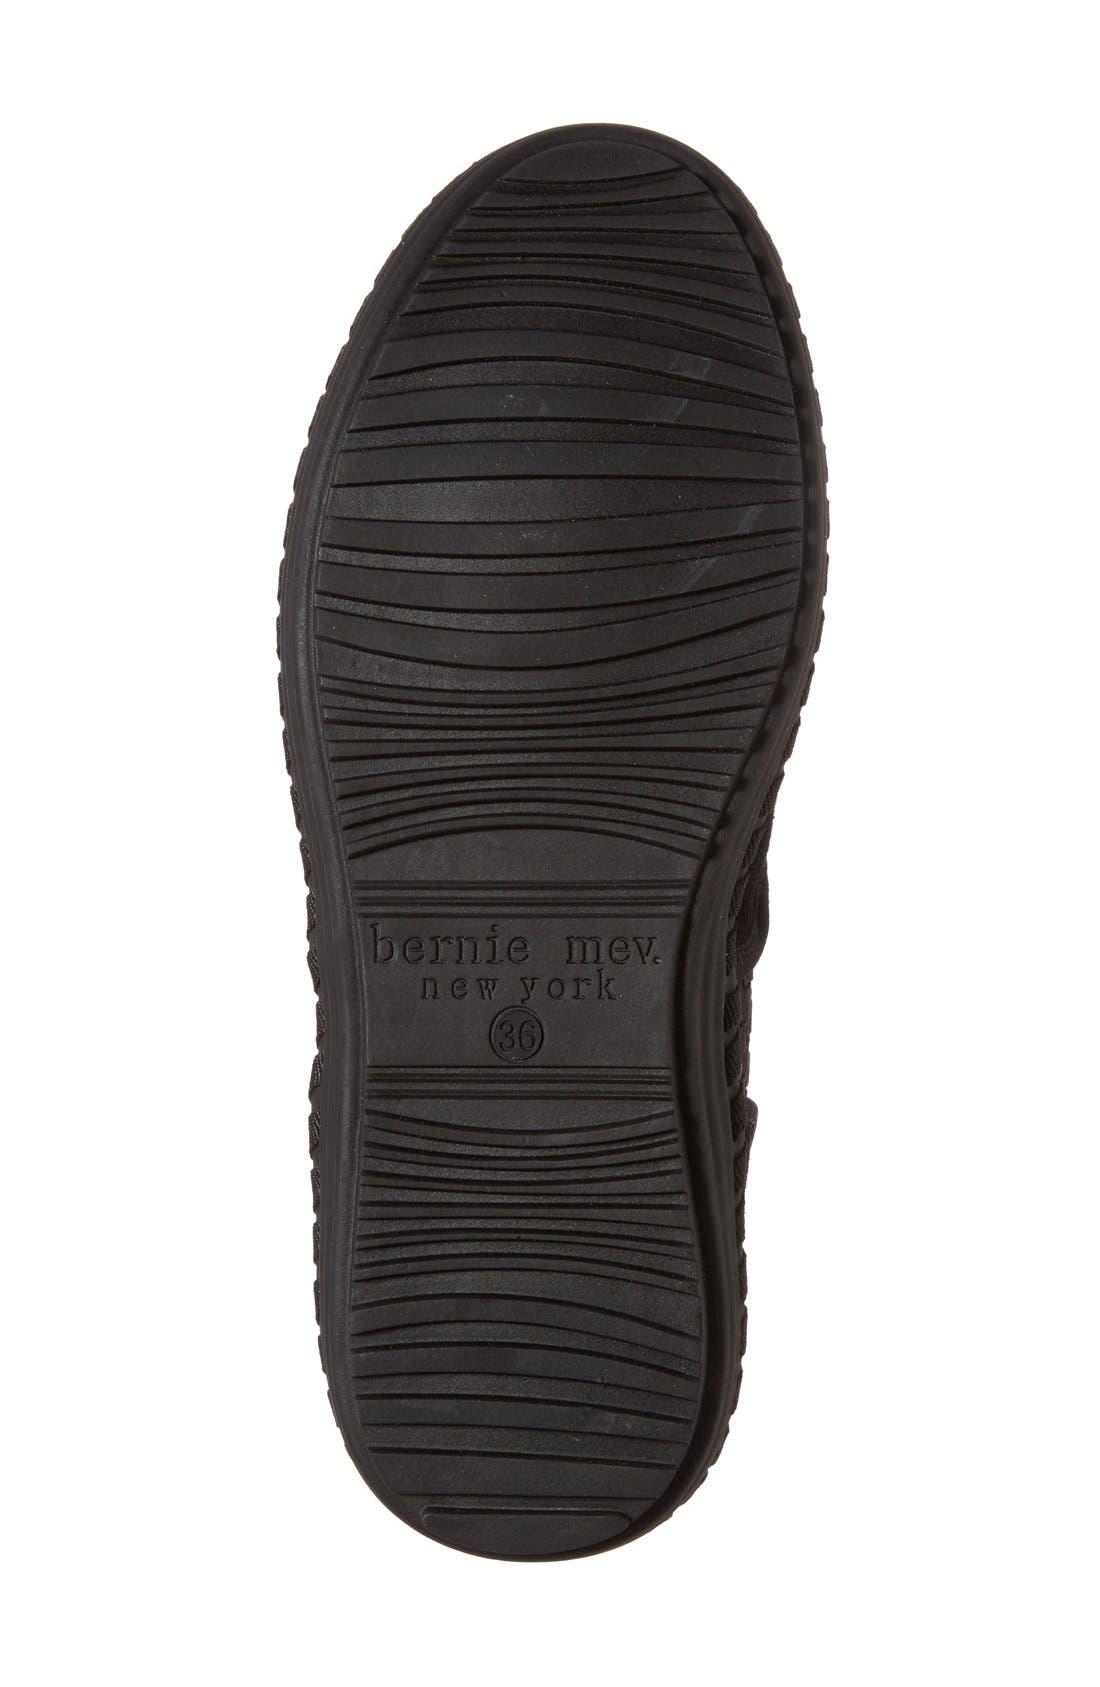 Faux Fur Lined Loafer Slipper,                             Alternate thumbnail 4, color,                             001